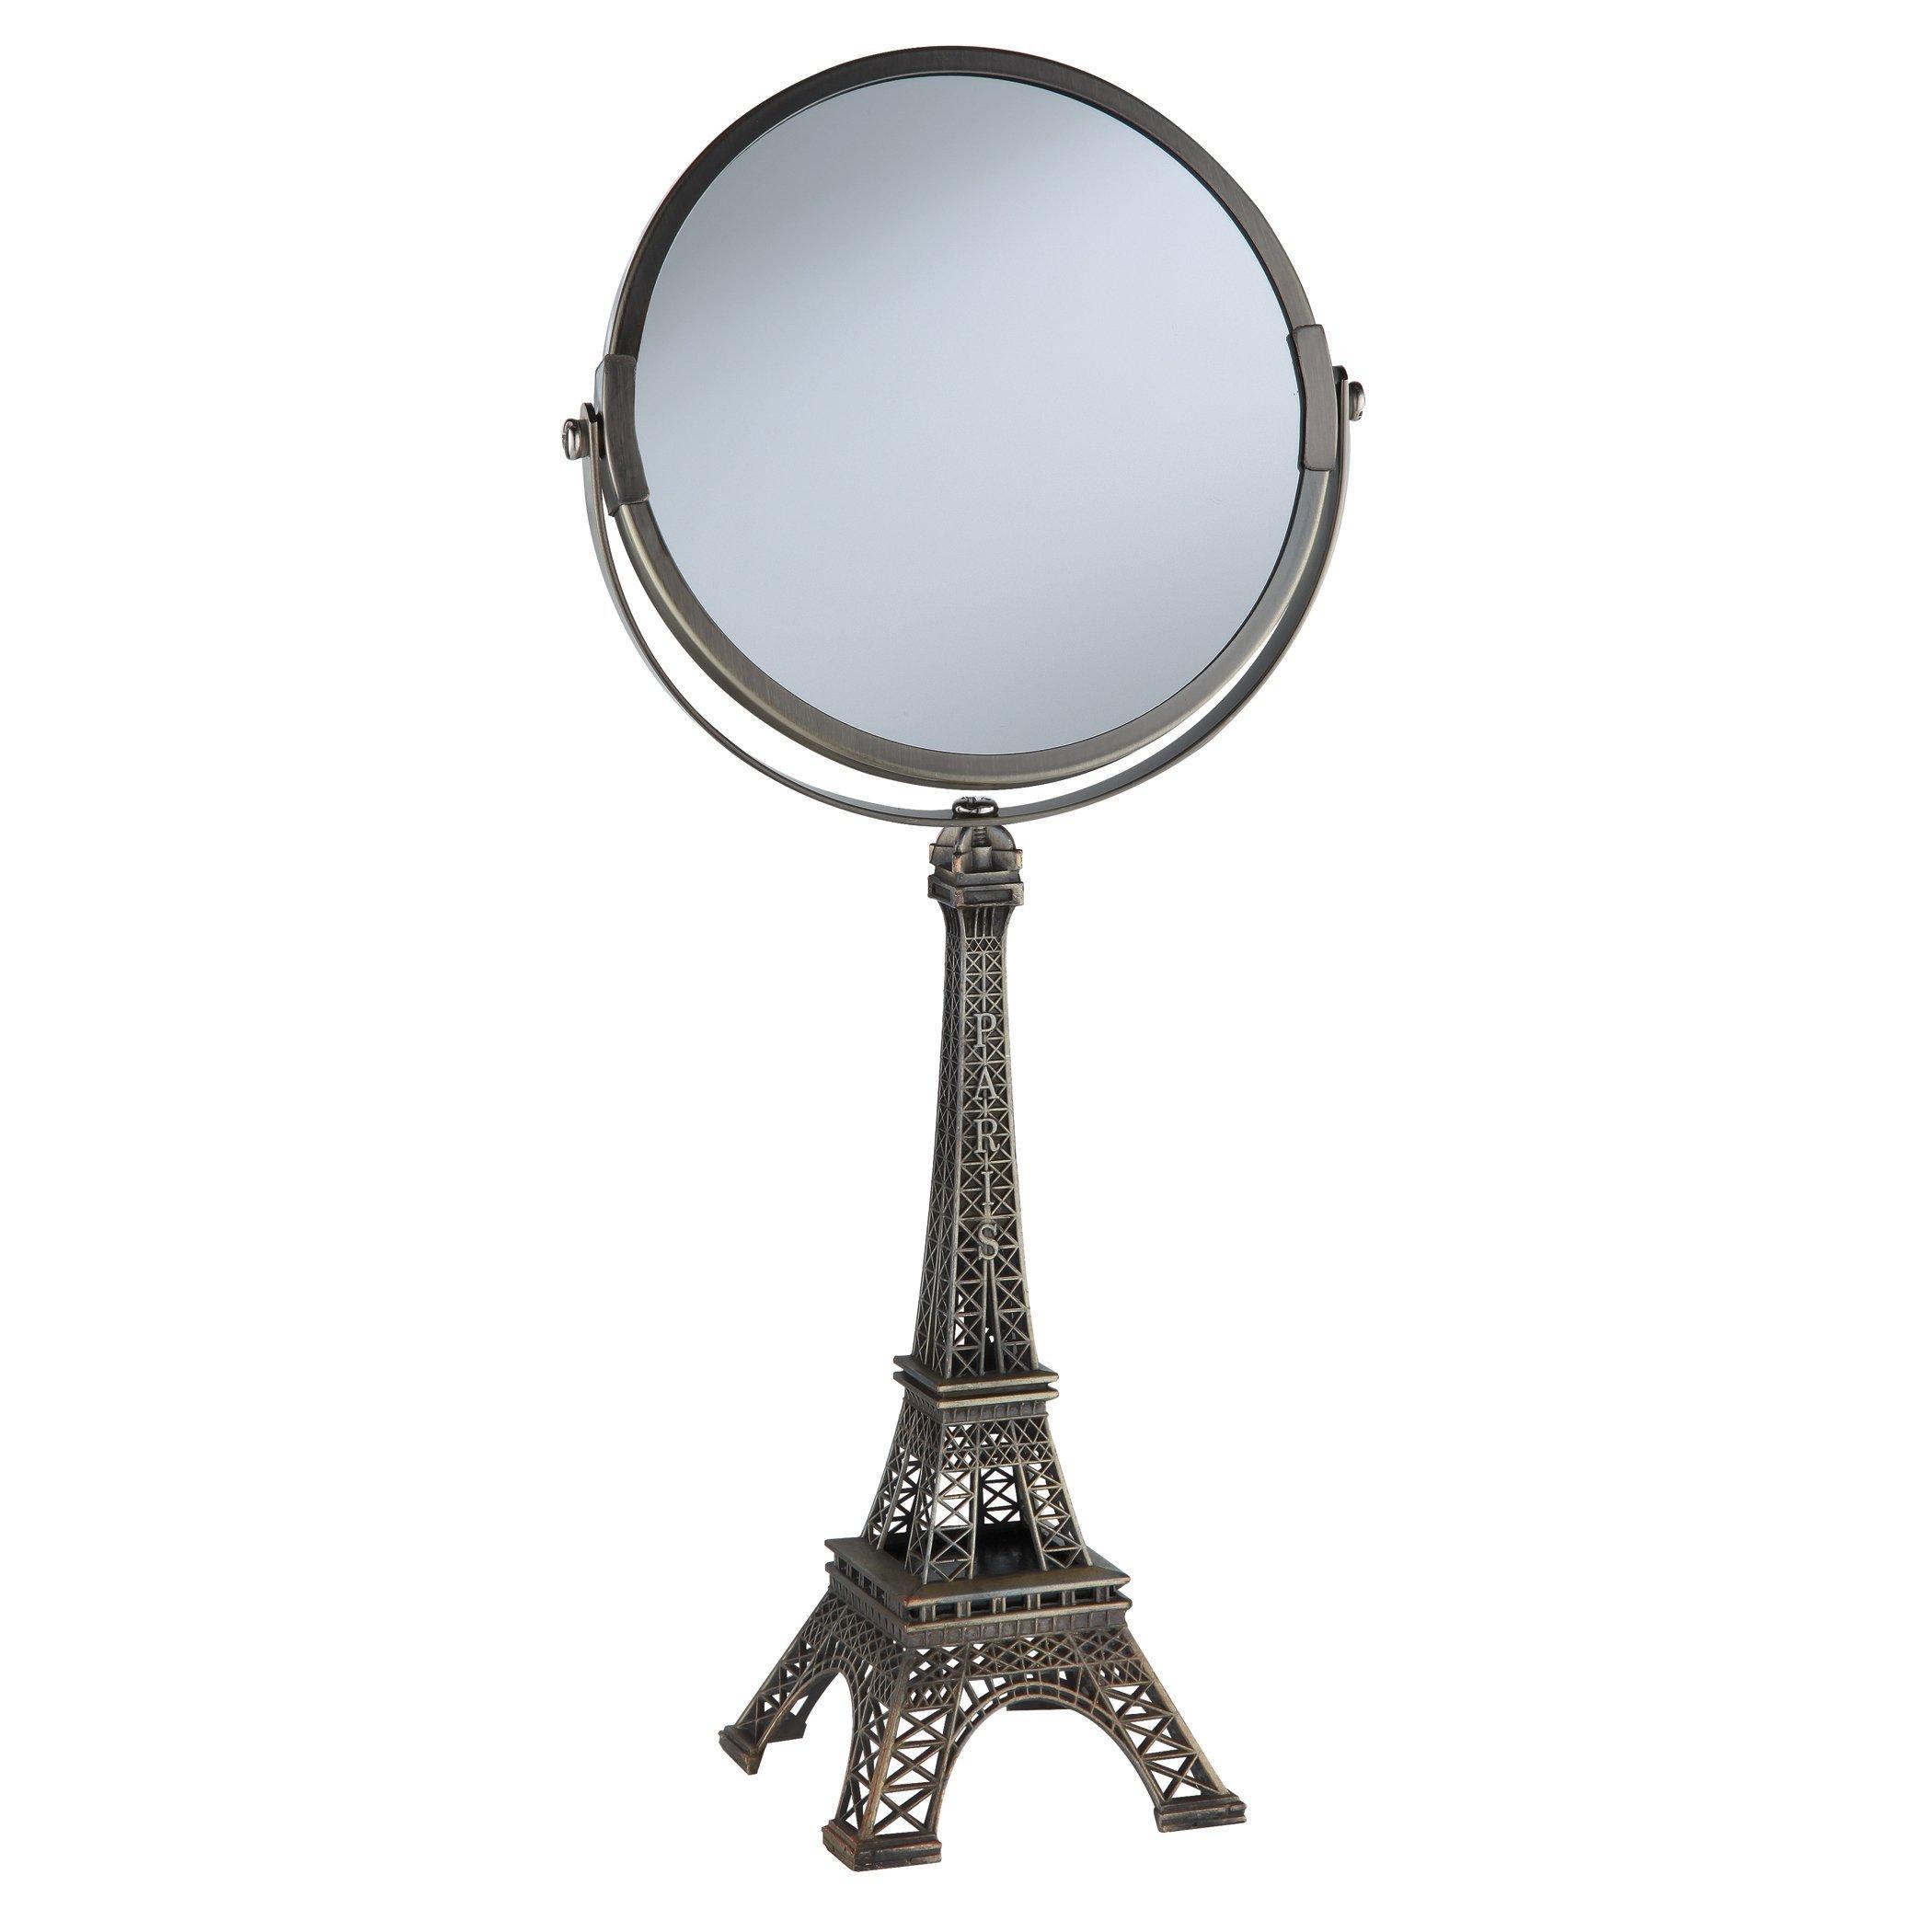 Taymor Mini Paris Mirror, One Size, Bronze